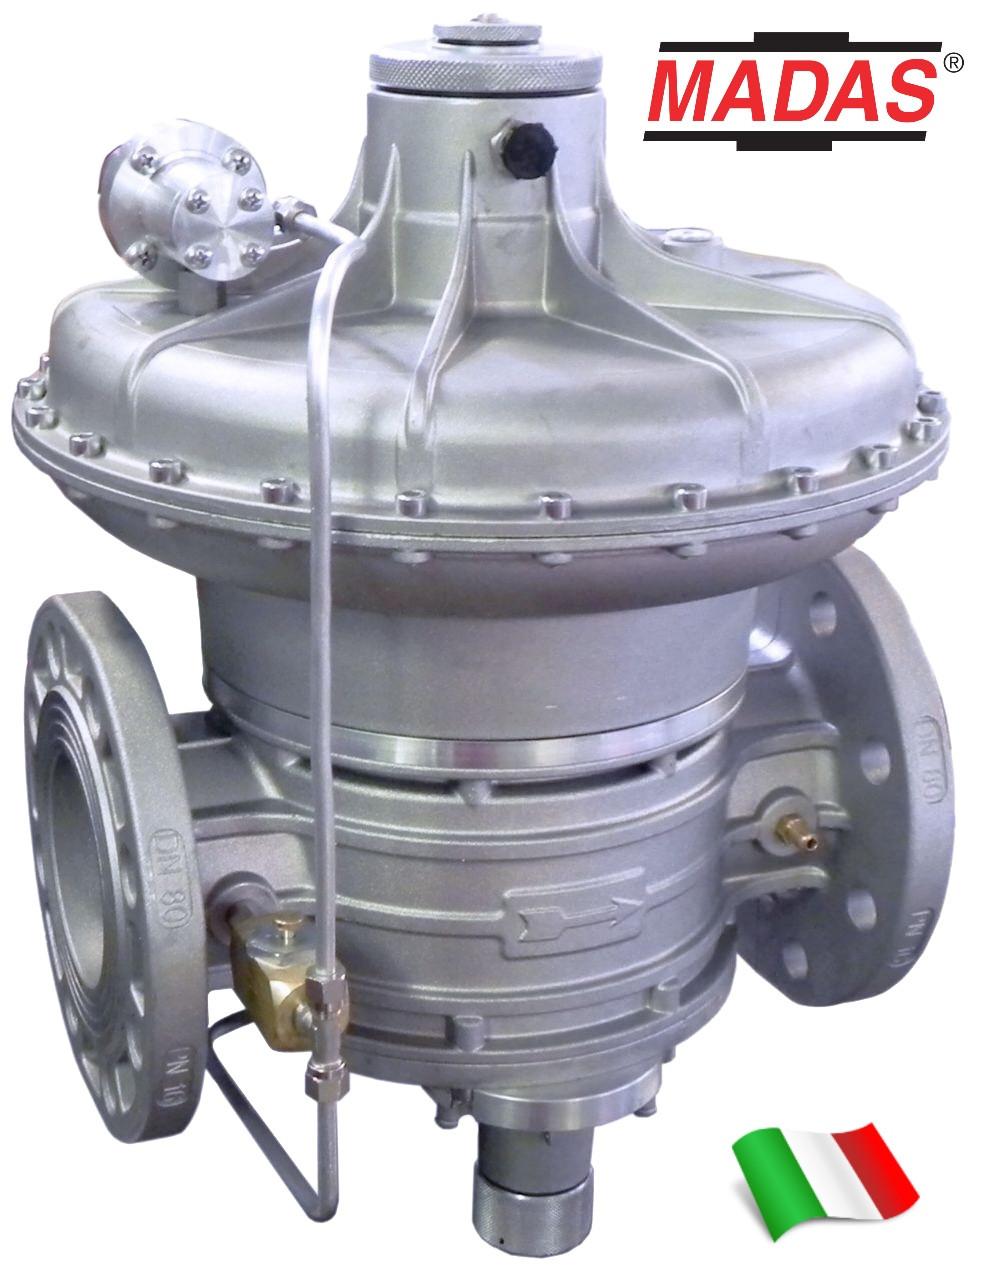 Регулятор давления газа RG/2MBHZ, DN80, MADAS